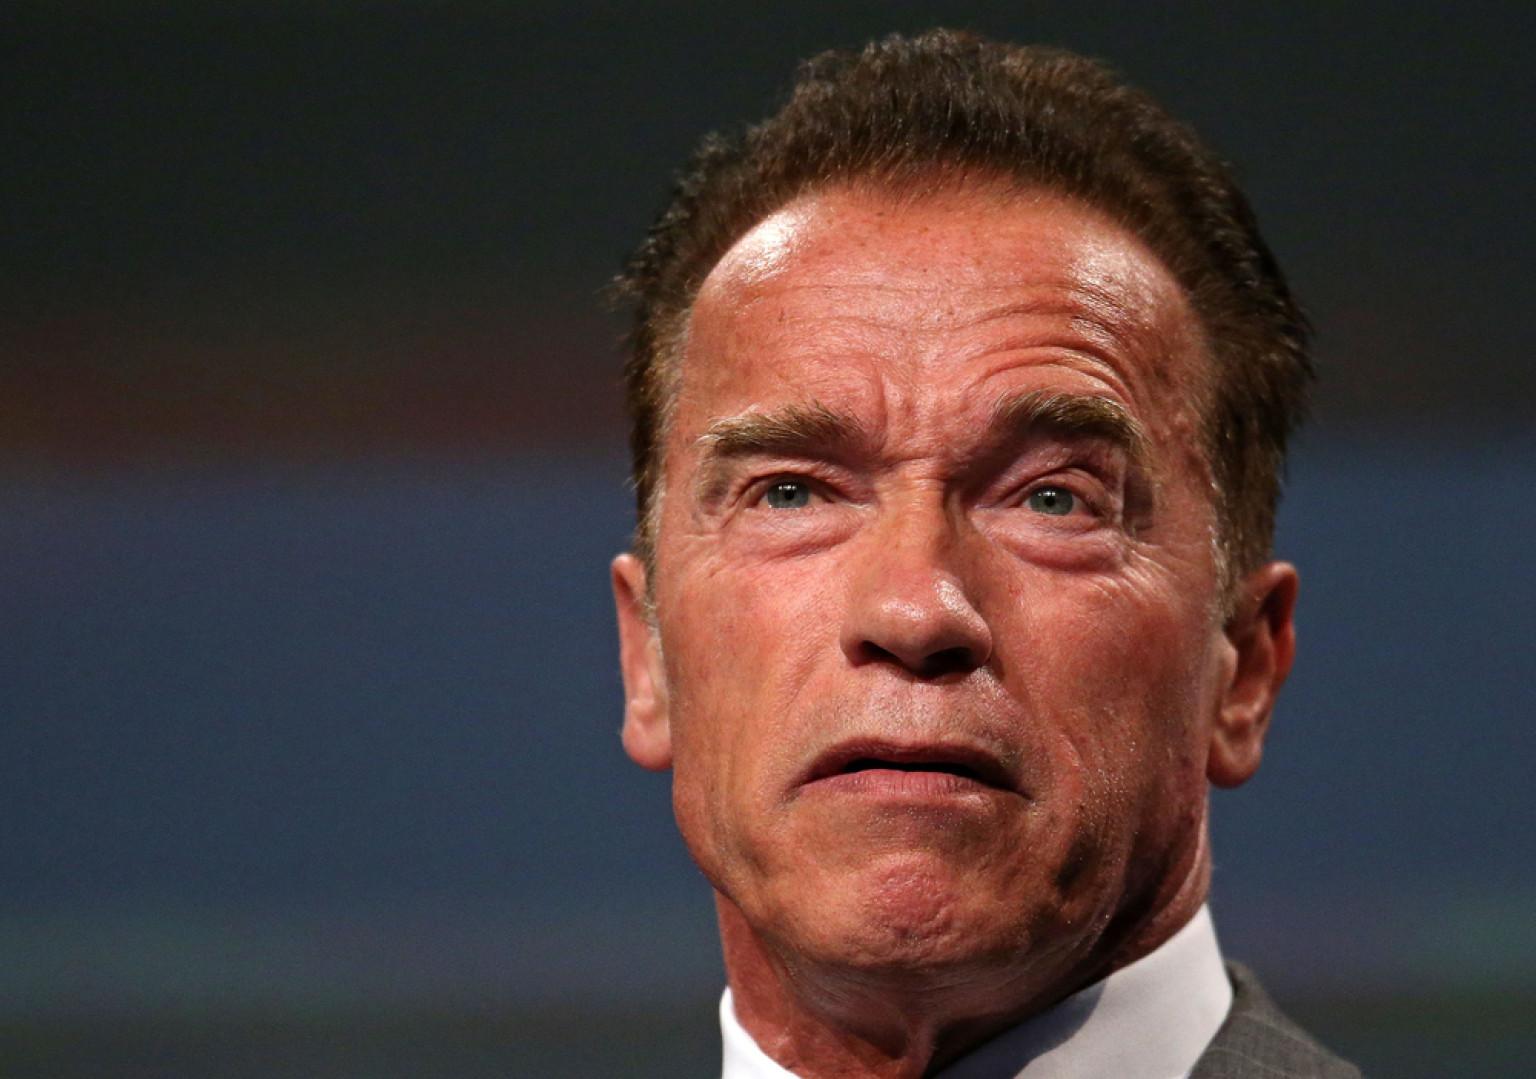 Arnold Schwarzenegger Thumbs